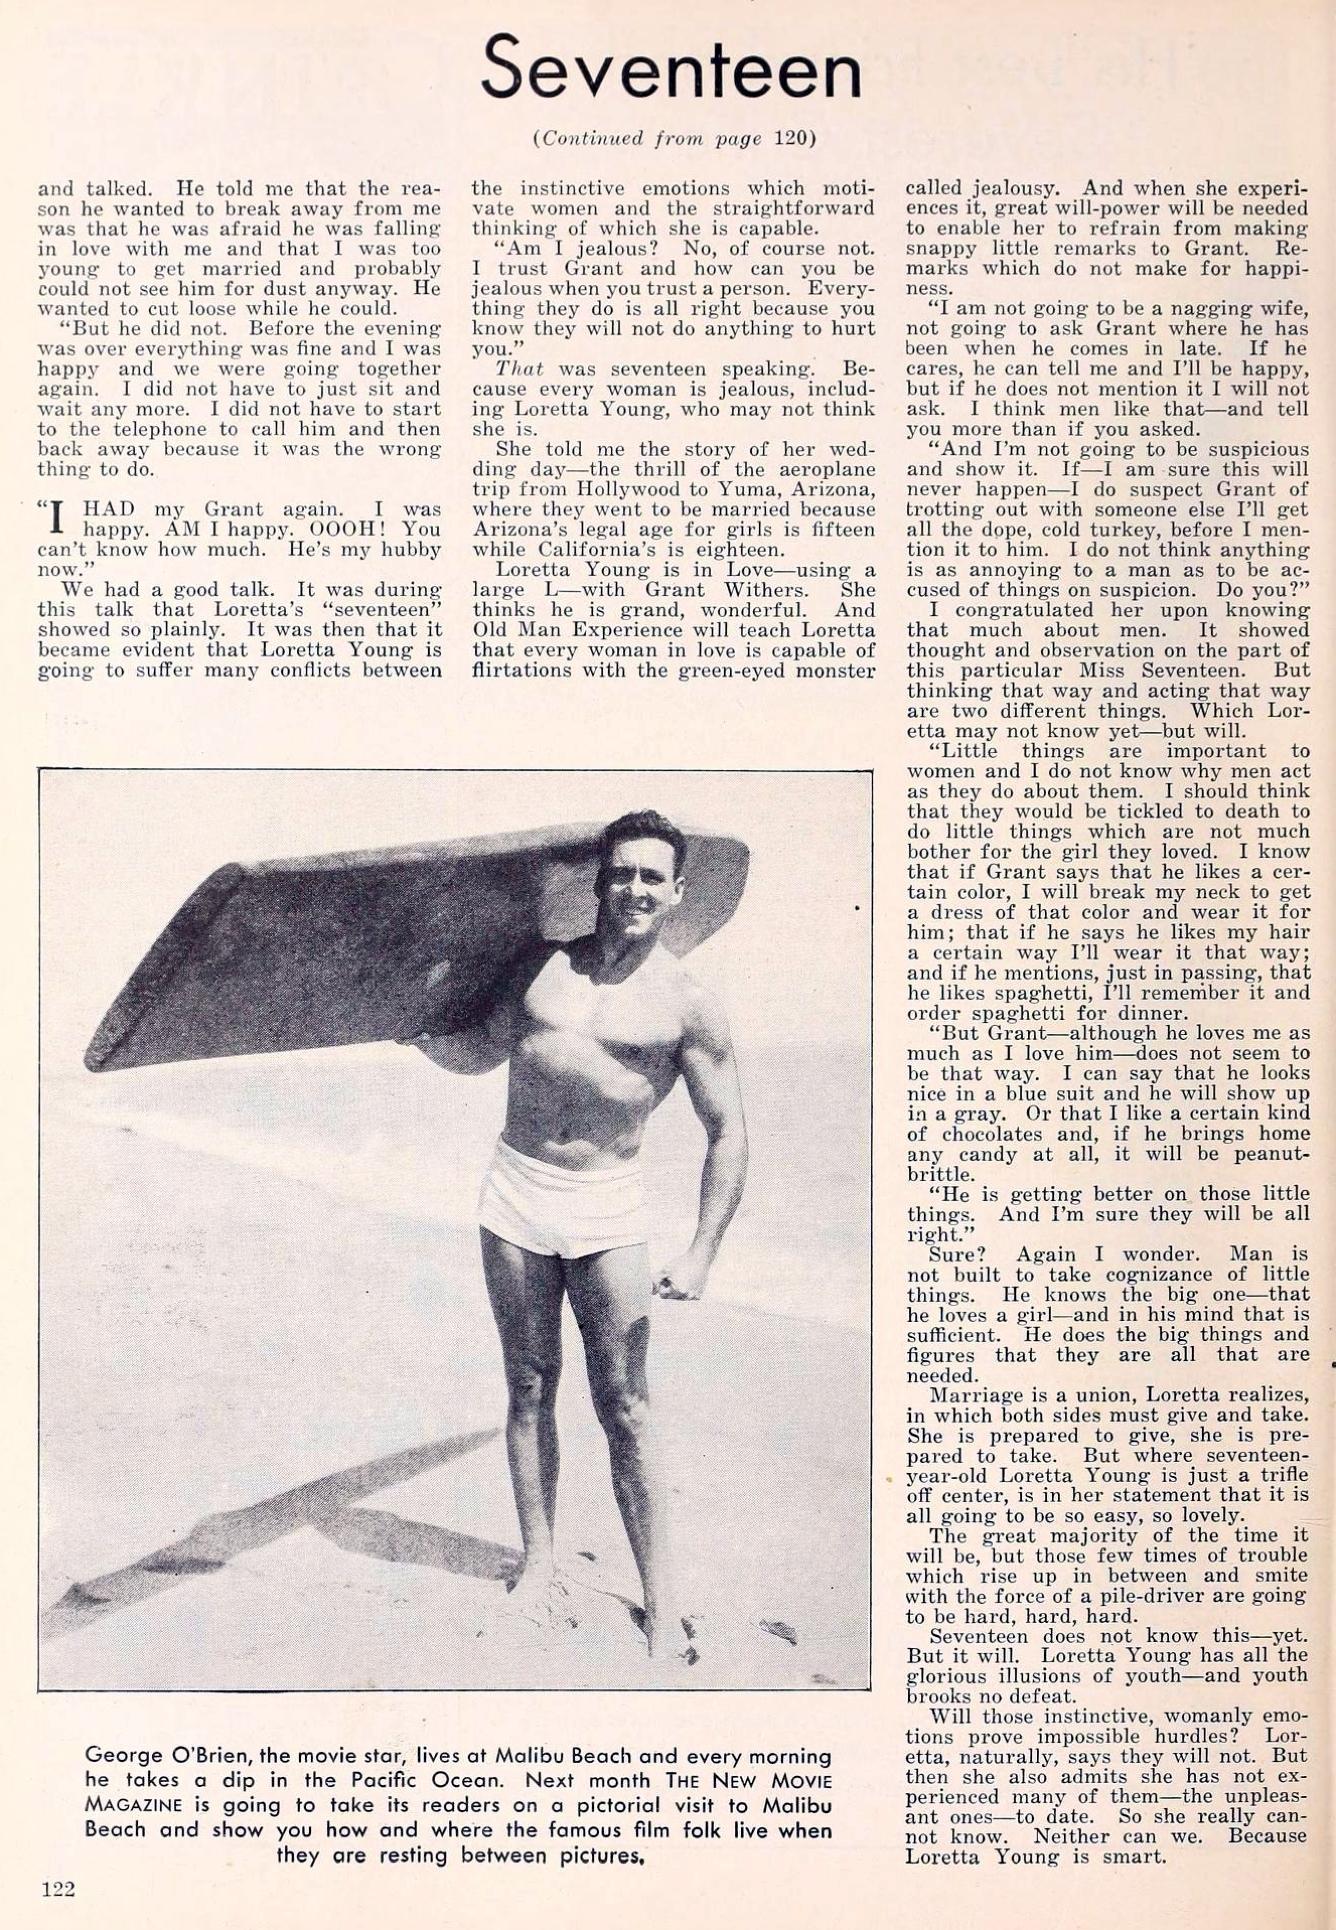 loretta young the new movie magazine april 1930 article 02a